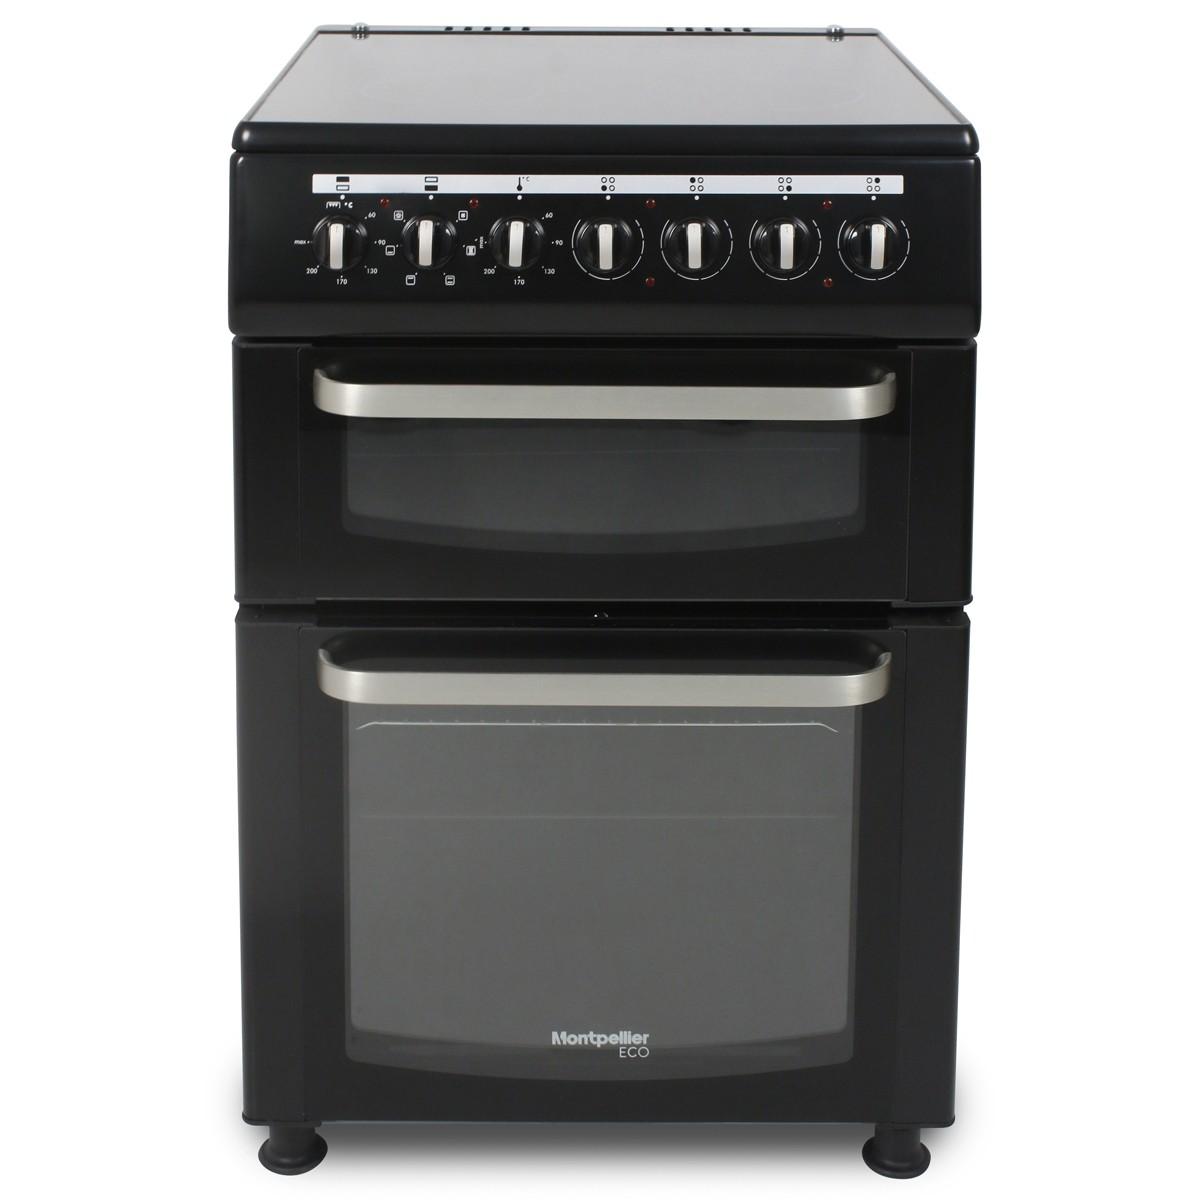 Montpellier TCC60BK Cooker